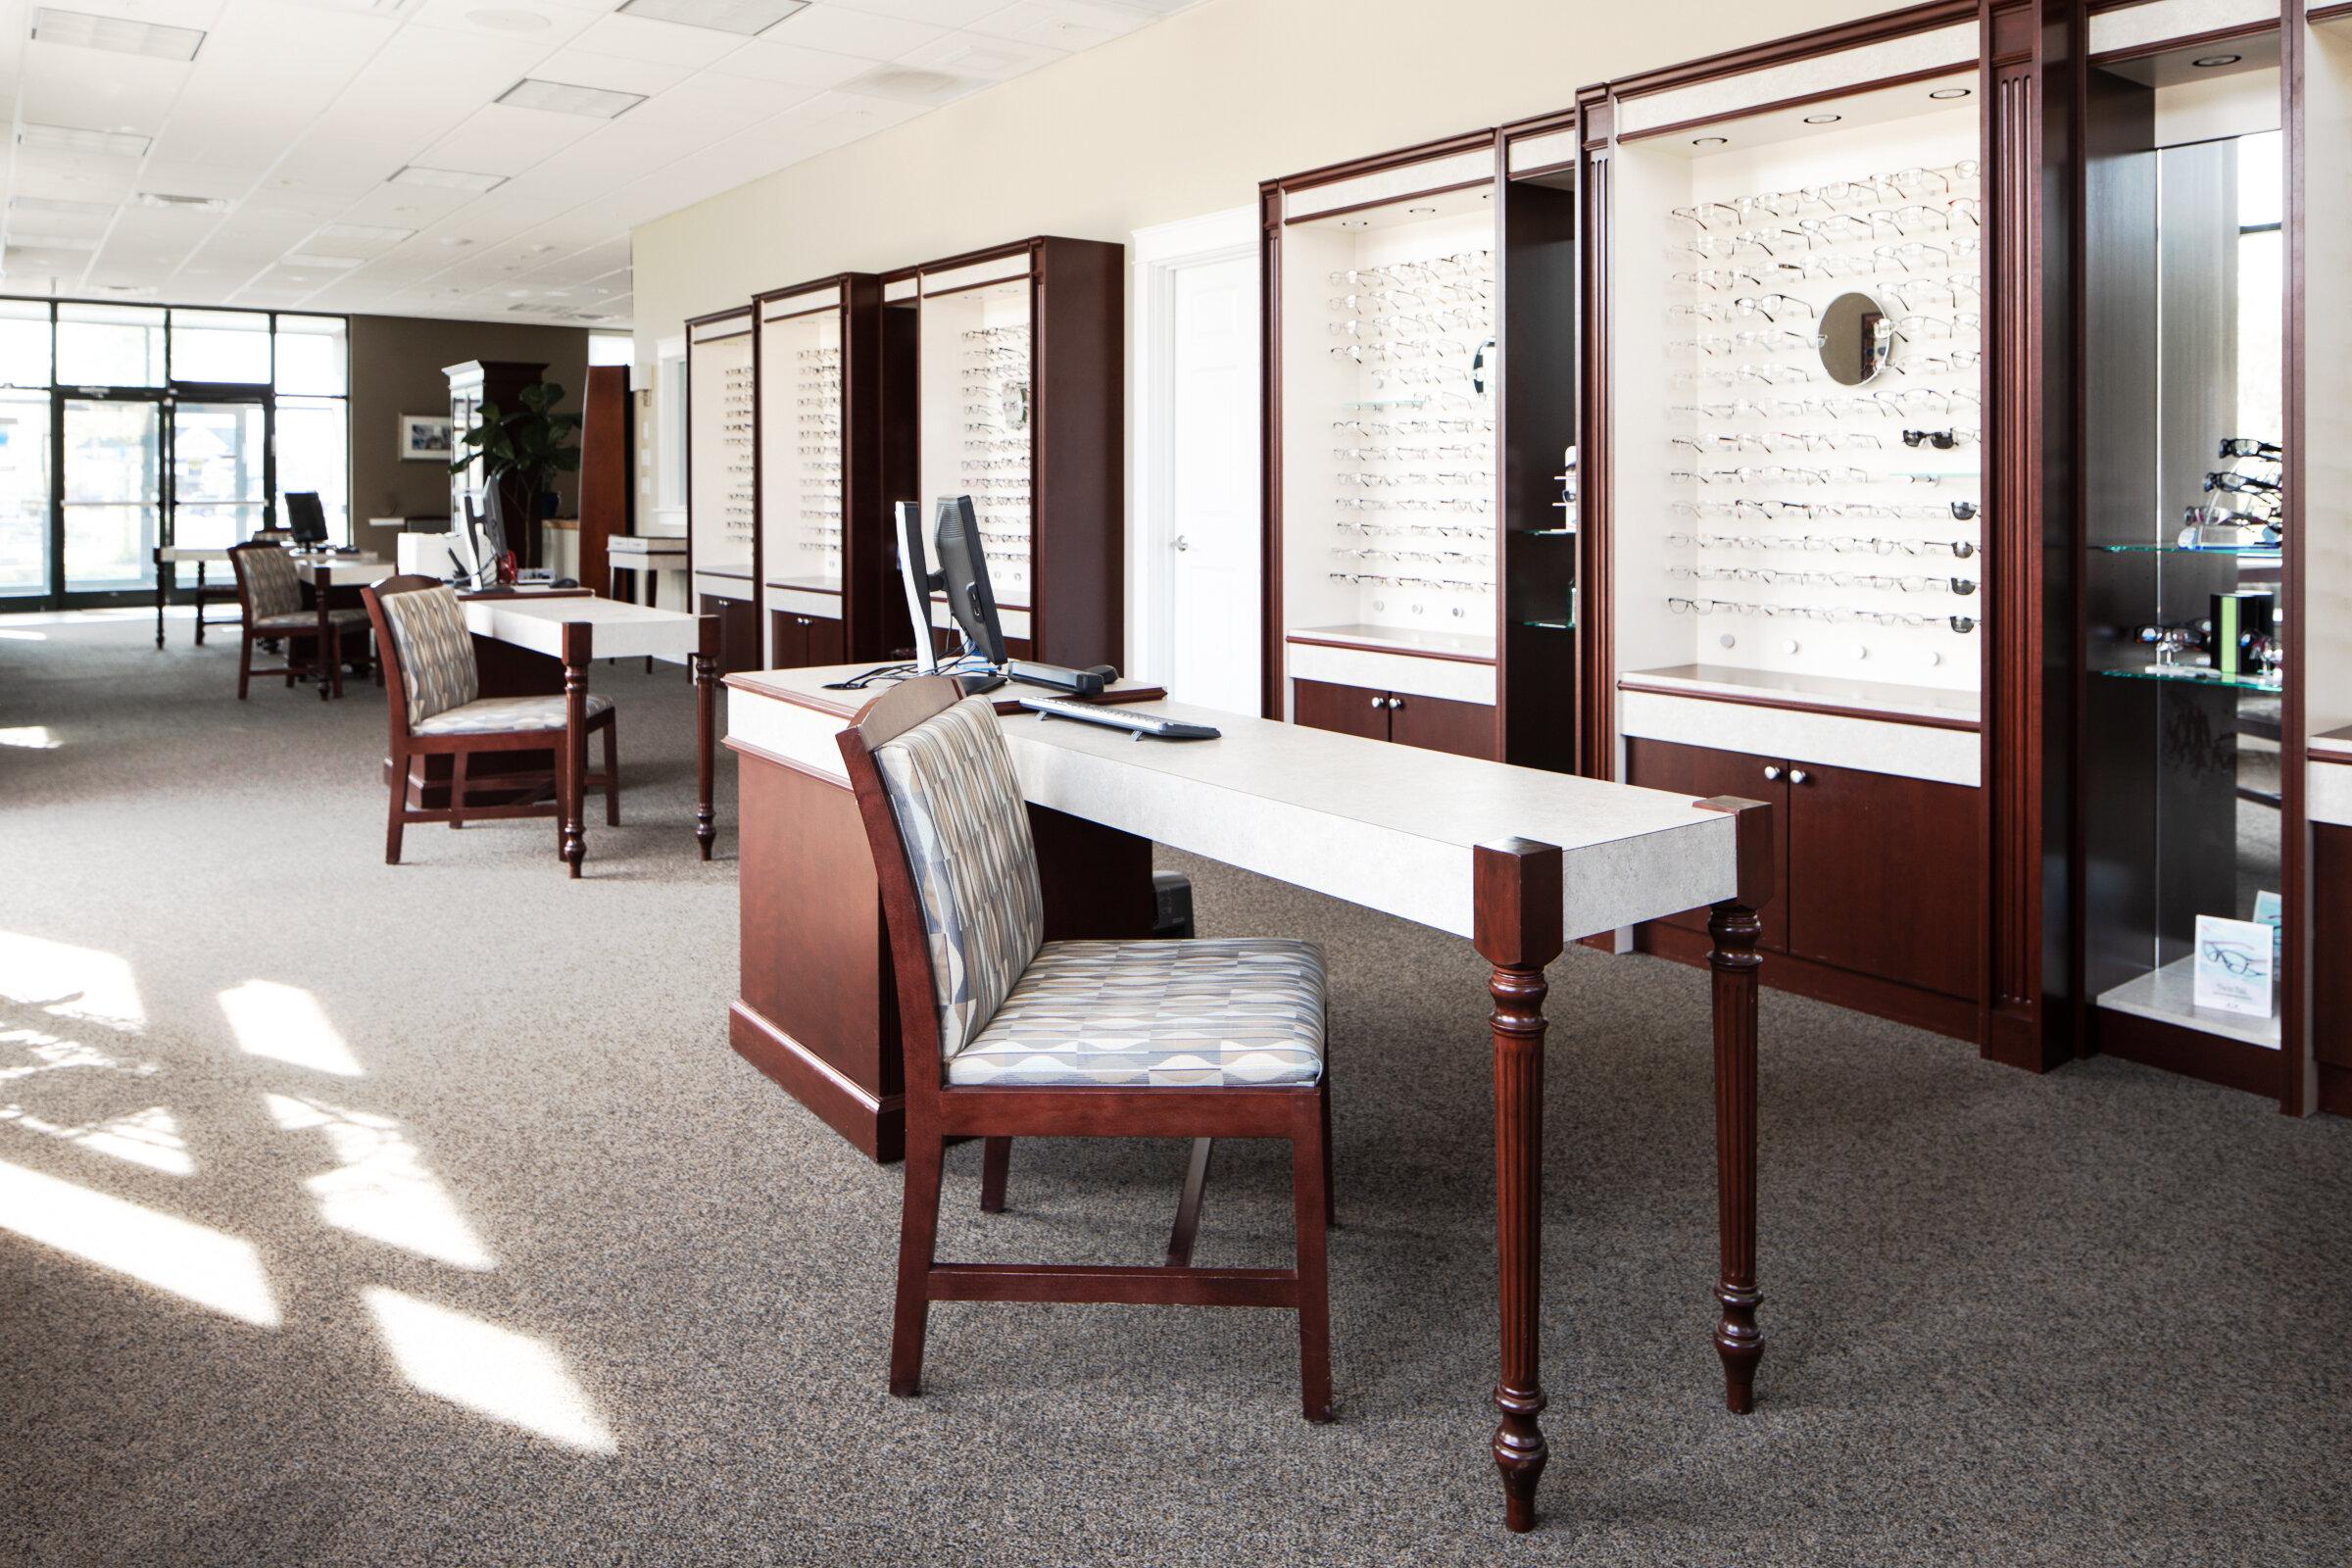 2 Associated EyeCare Optical Shop Kennebunk Office © Heidi Kirn Photography 452954.jpg